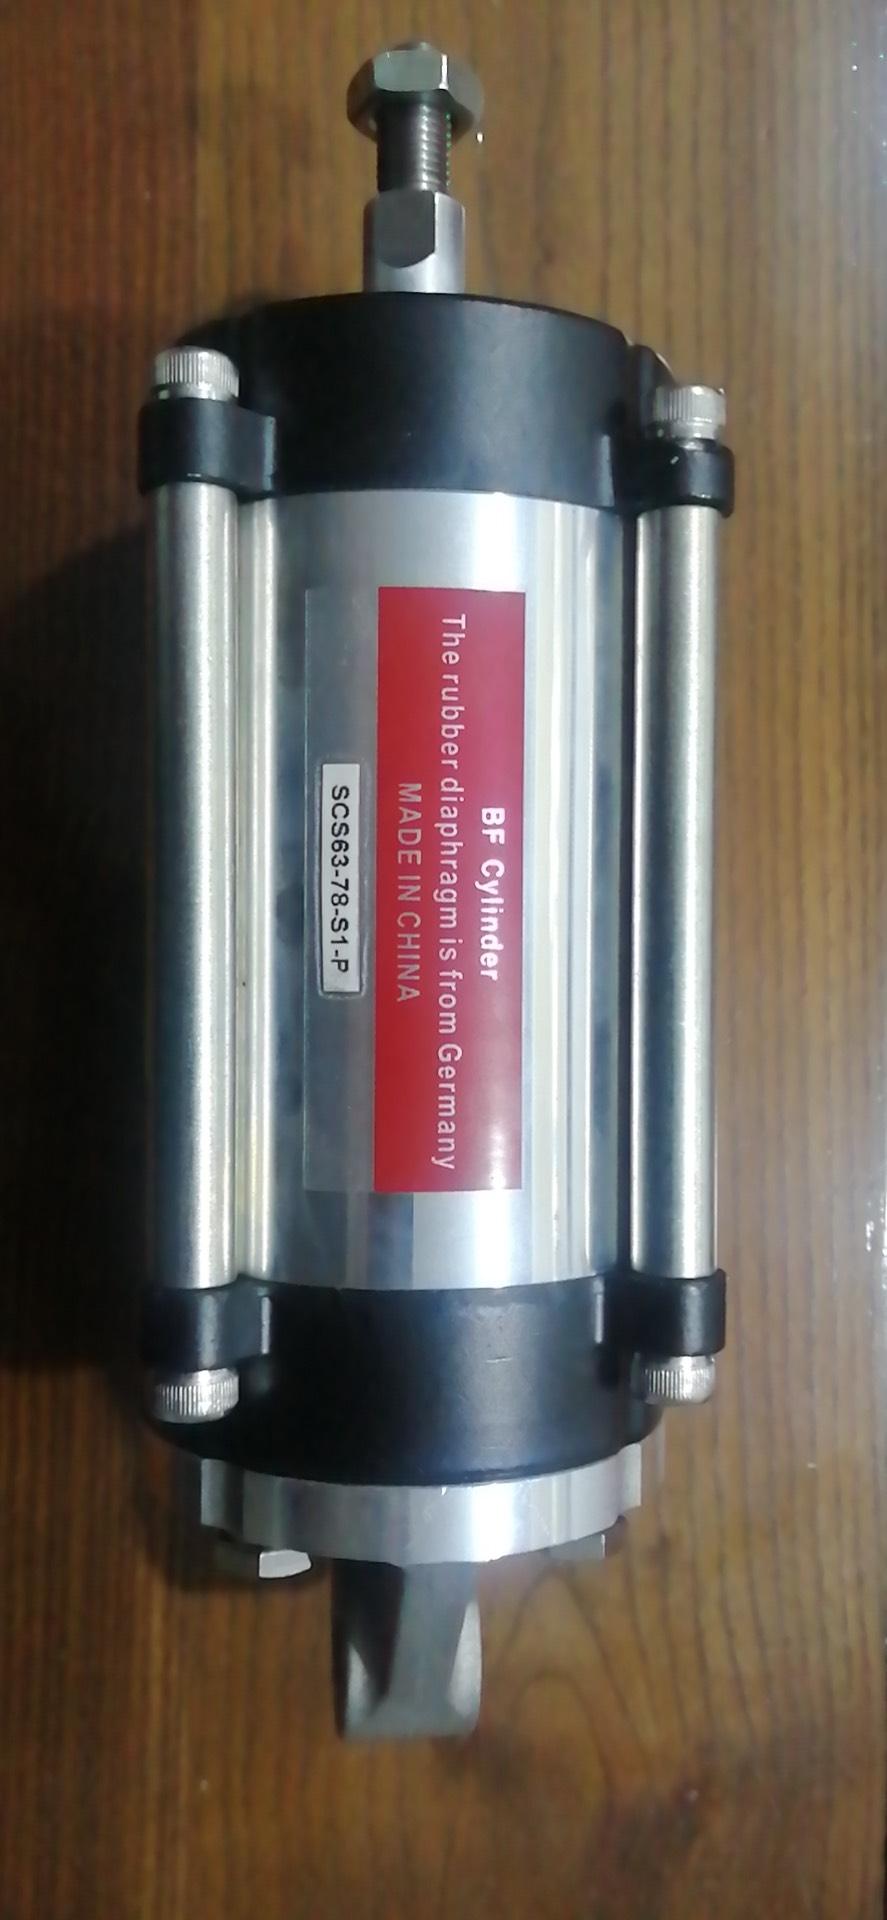 Xilanh hơi SCS63-78 SCS40-36 SCS40-50 SCS40-48 SCS50*36 SCS50-42 SCS50-64 SCS63-75